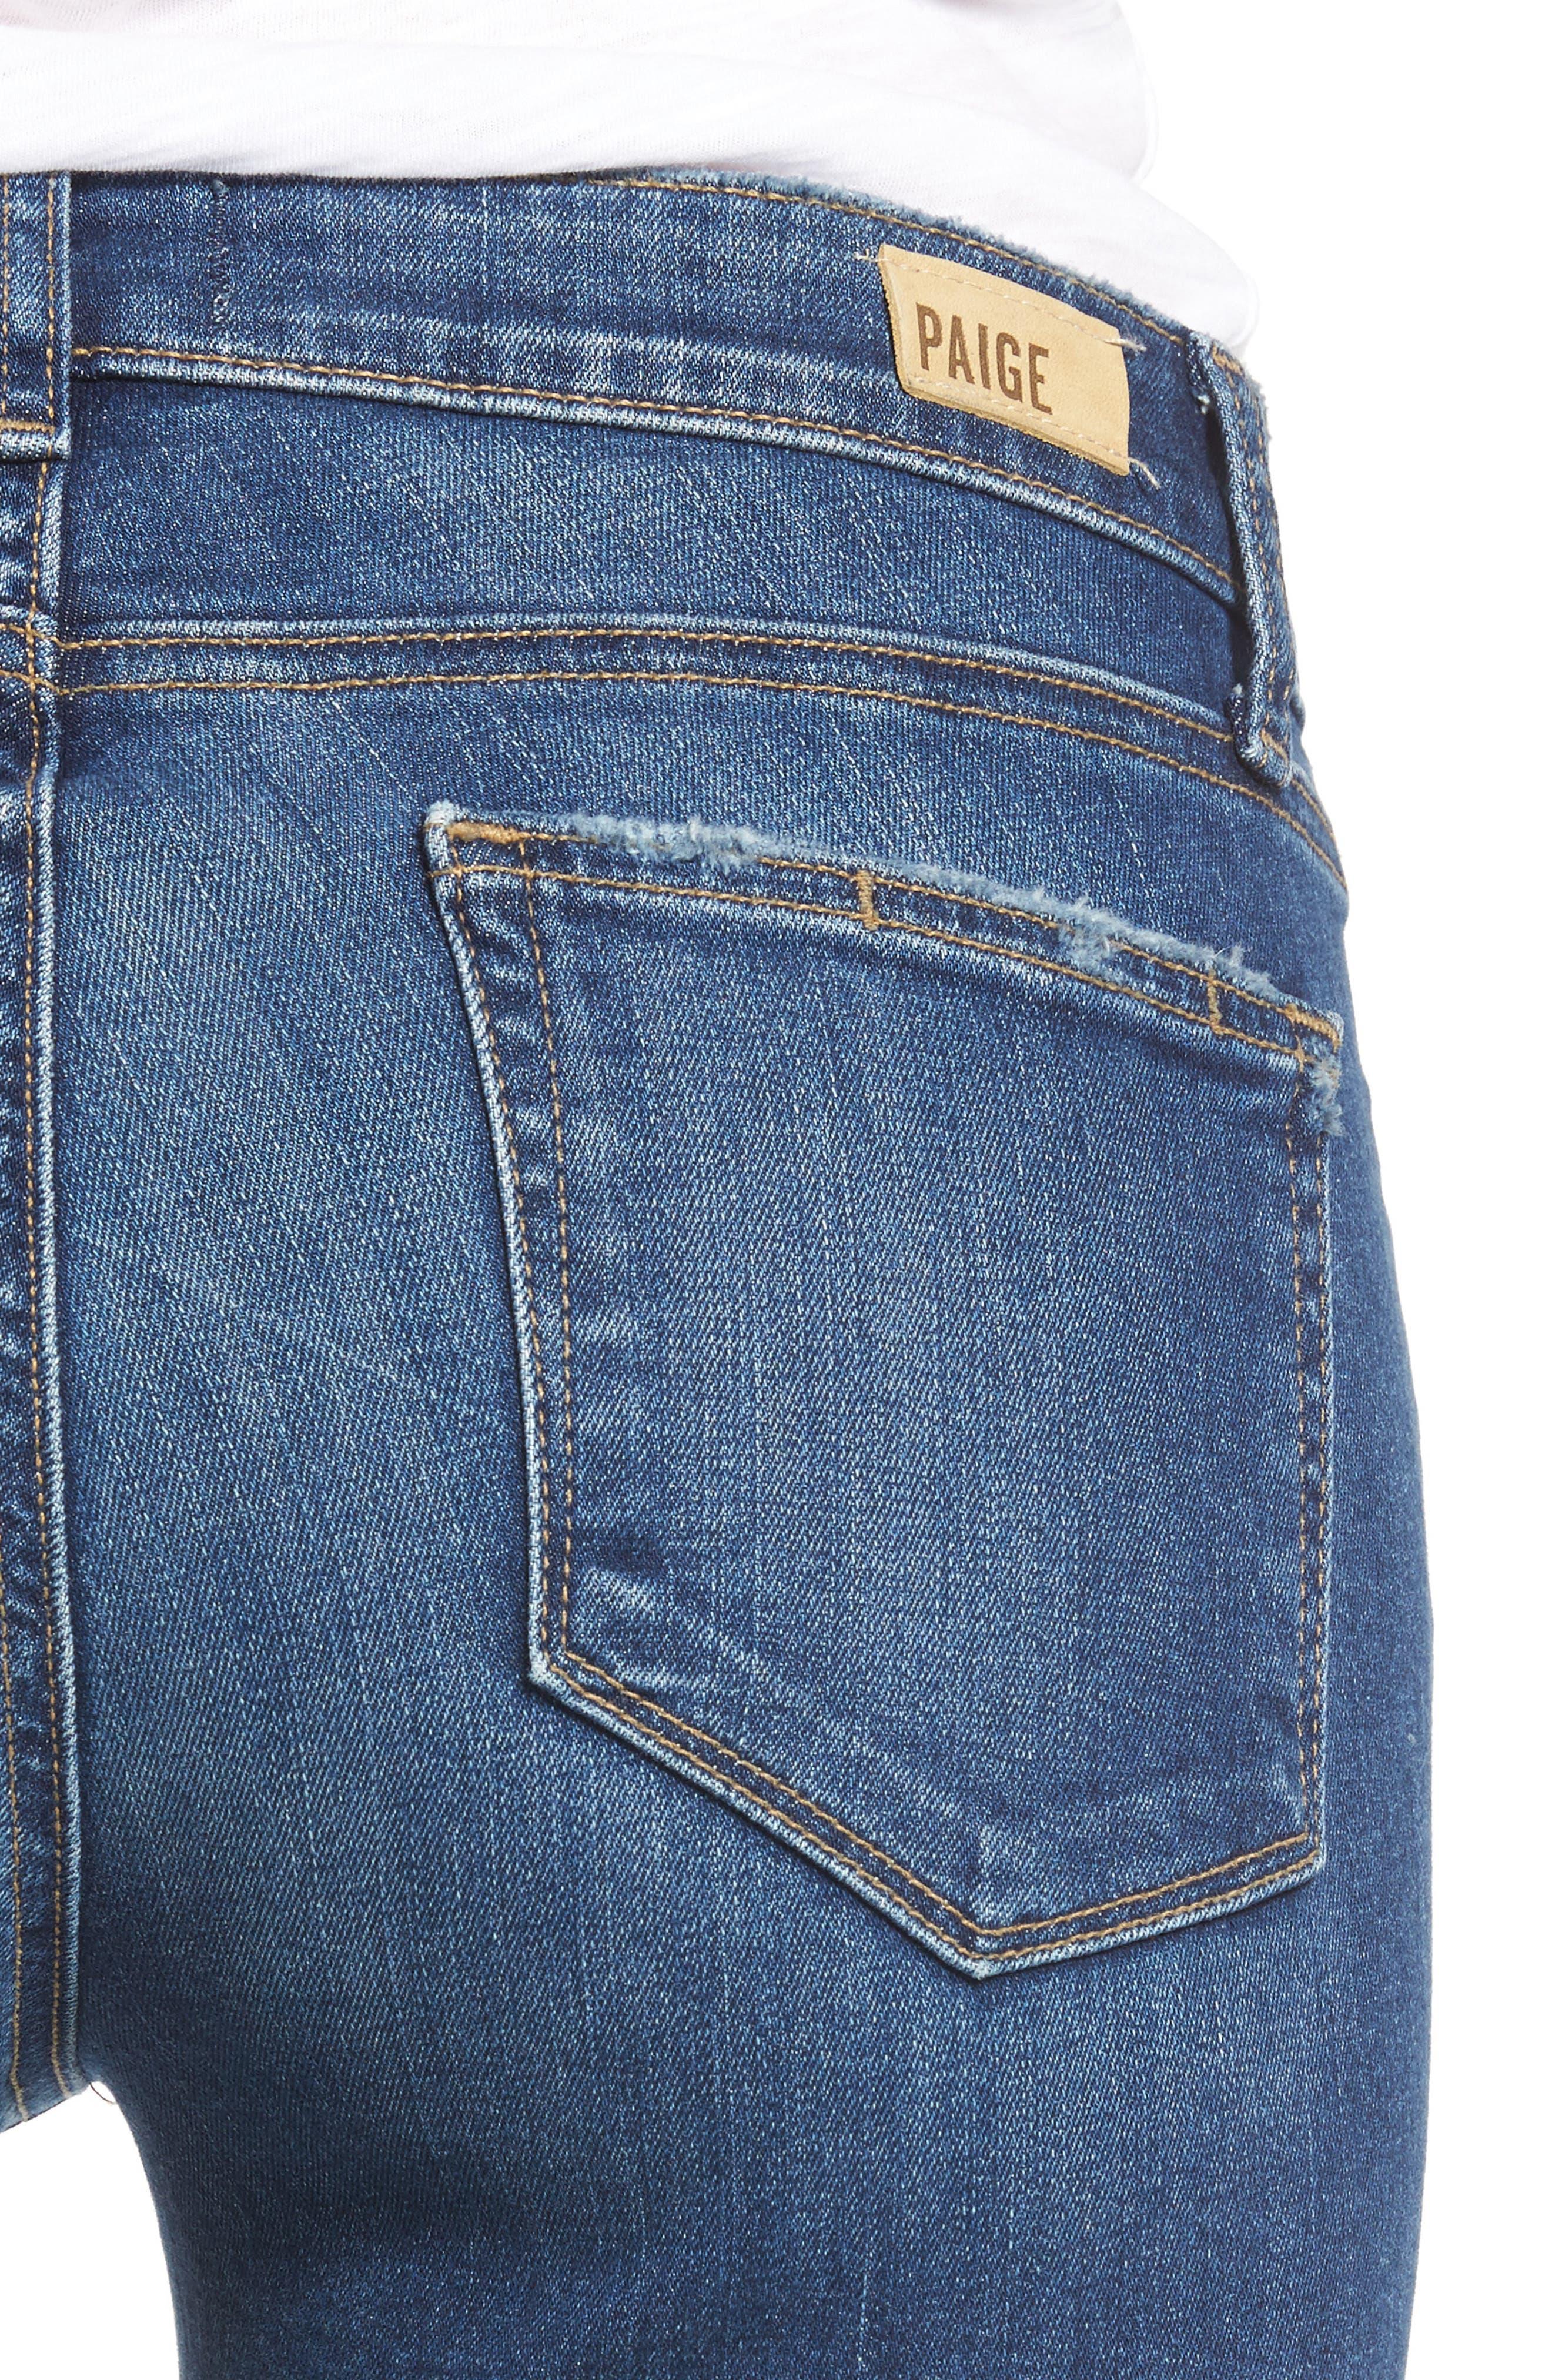 Skyline Skinny Jeans,                             Alternate thumbnail 5, color,                             400